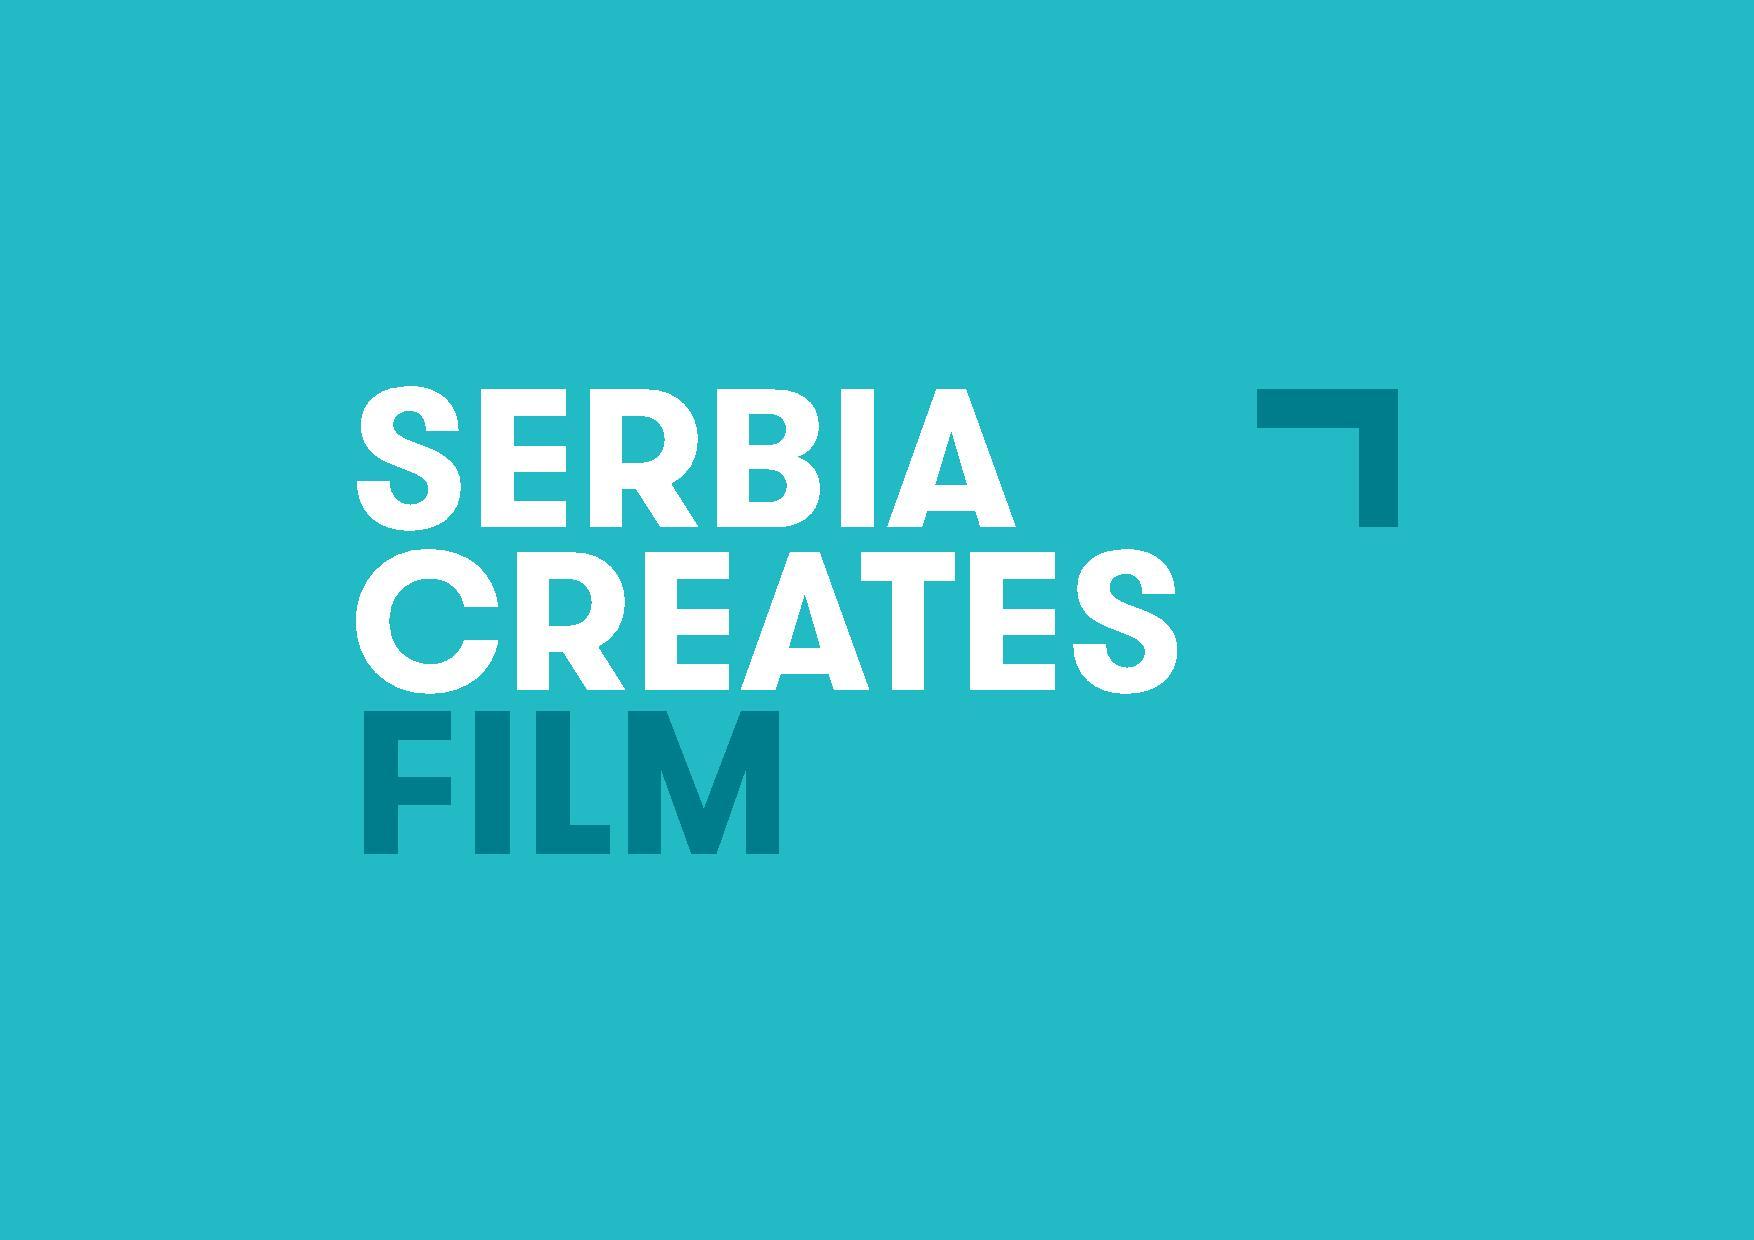 serbia-creates-film-engleski-1-page-001